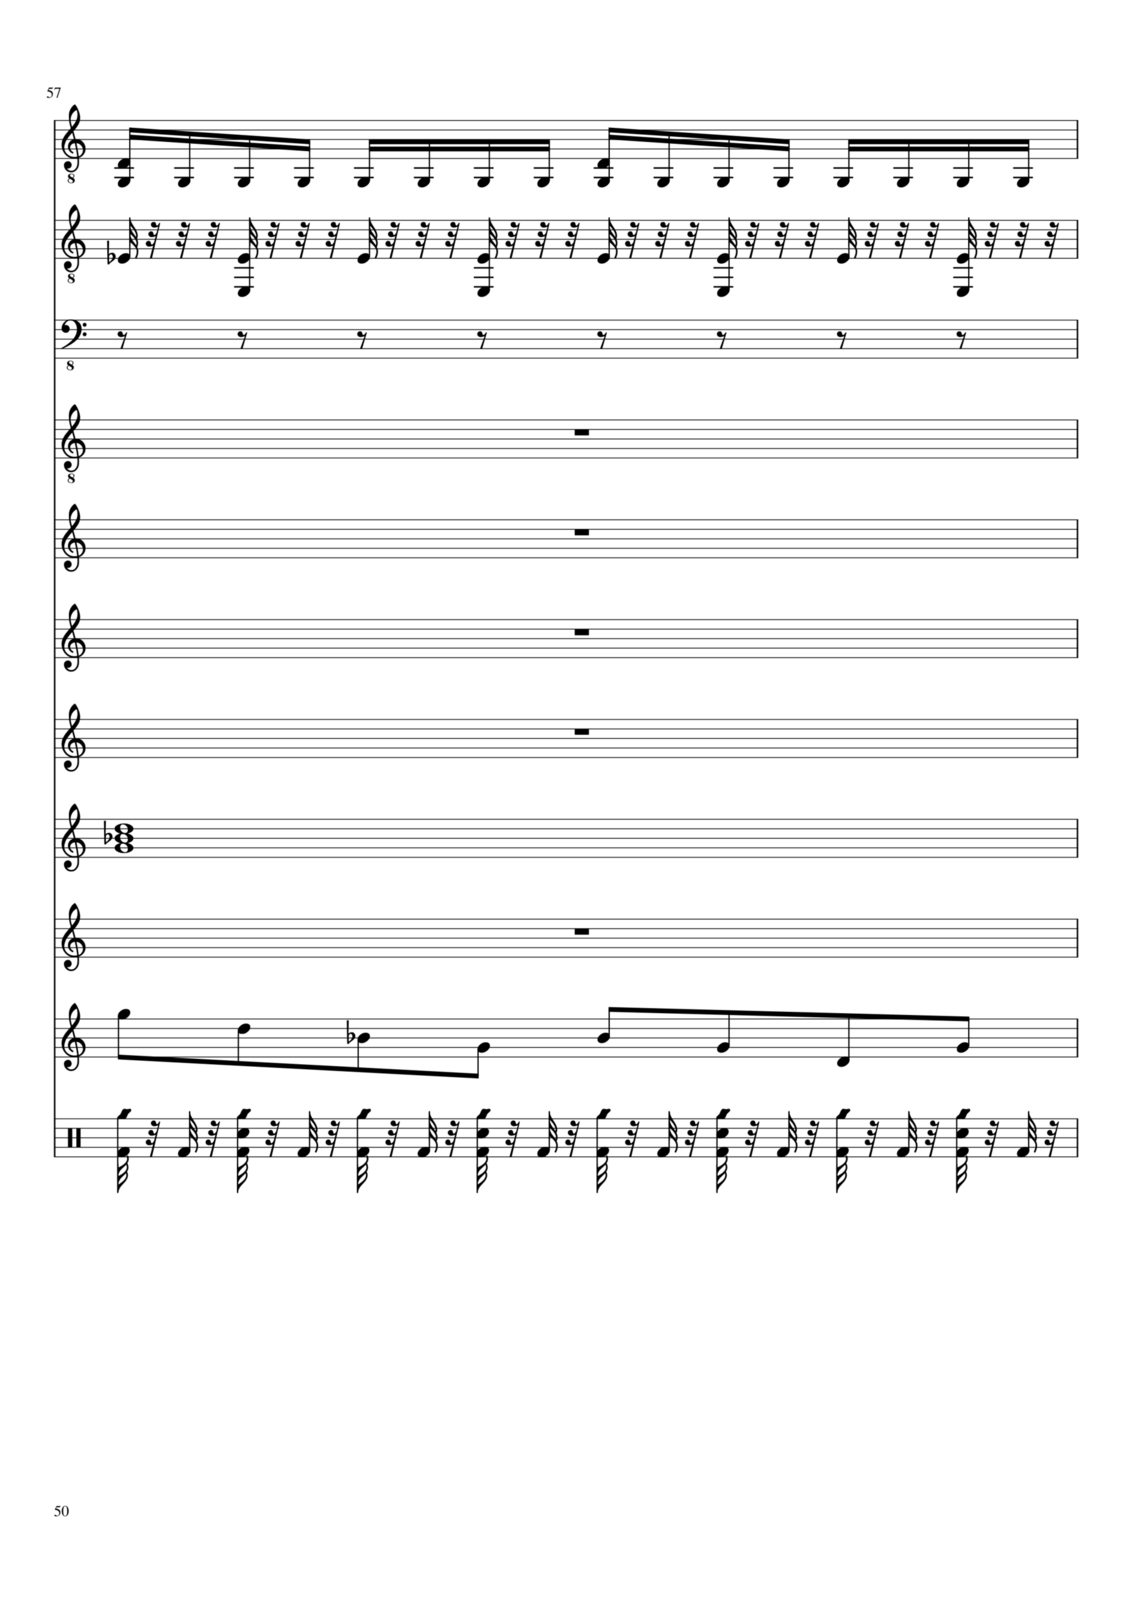 Belyiy sokol slide, Image 50